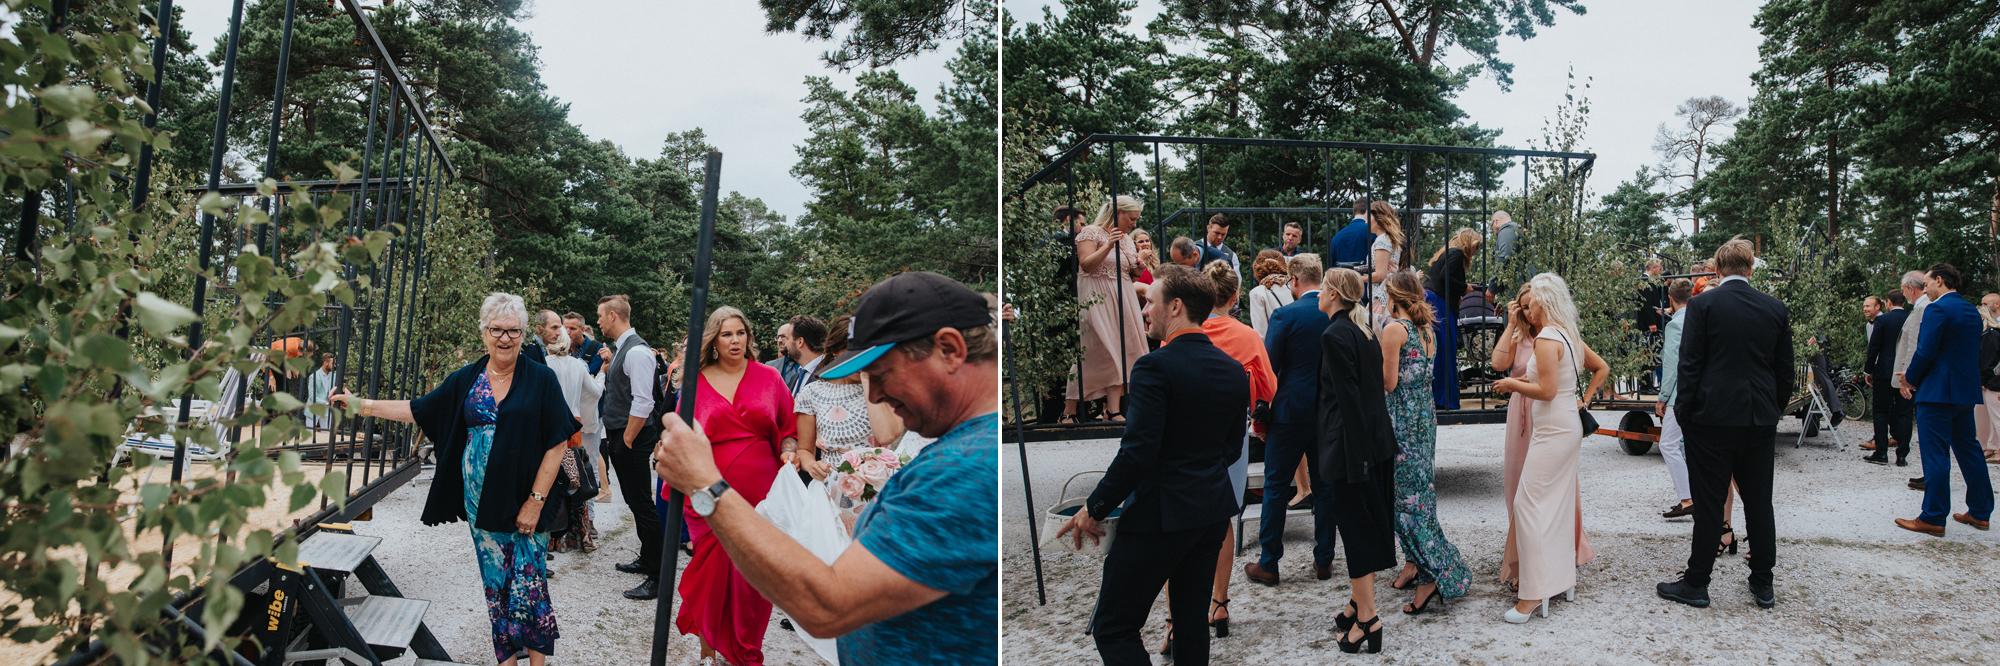 046-bröllopsfotograf-folhammar-gotland-neas-fotografi.jpg